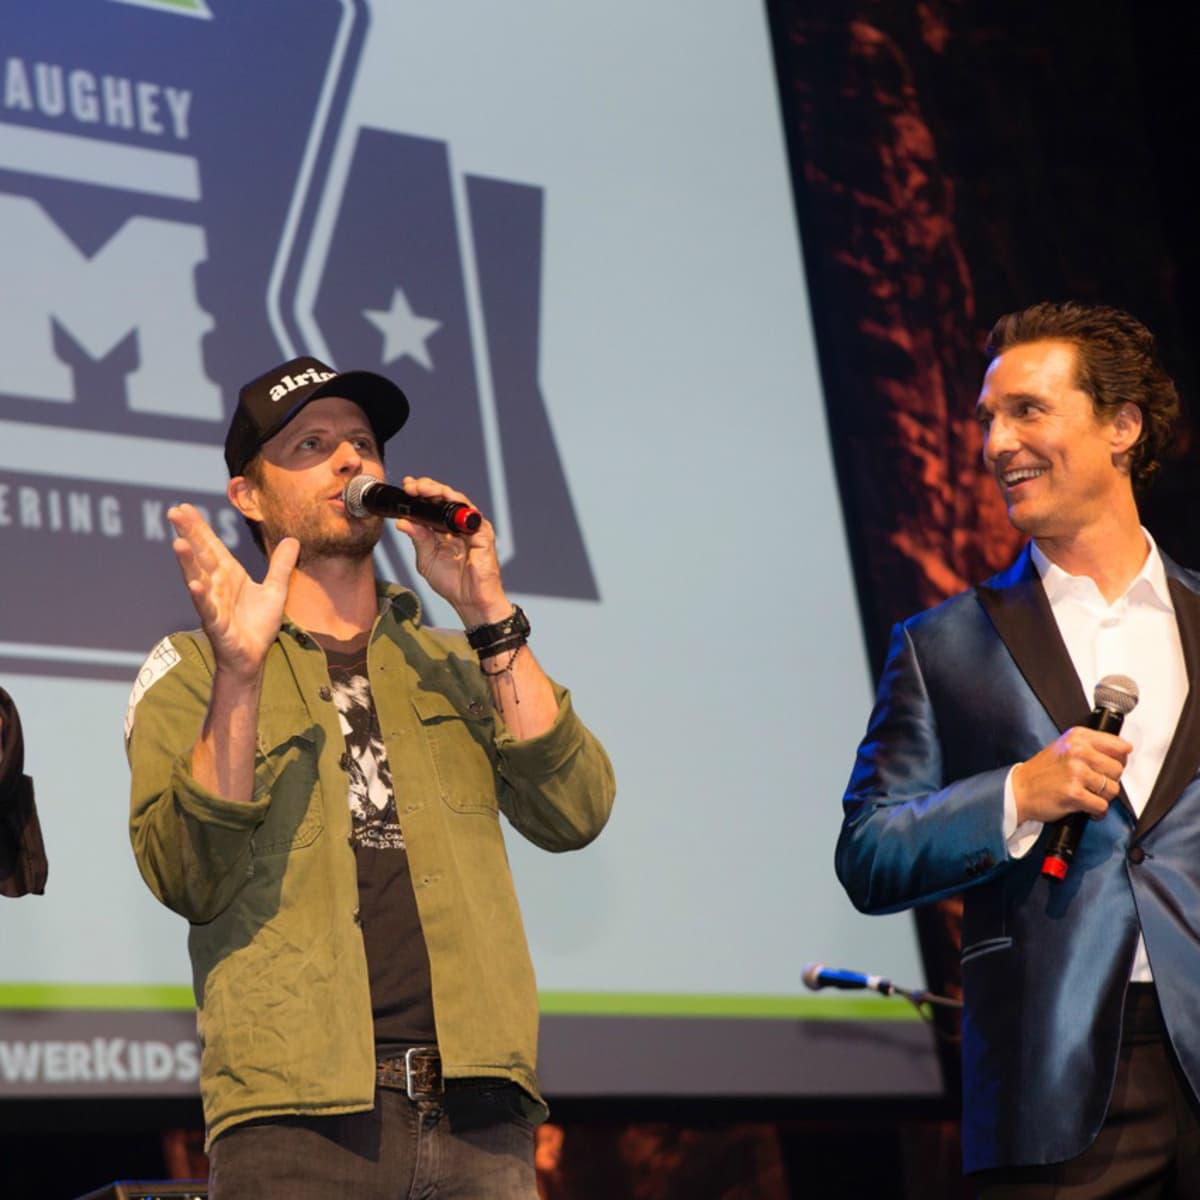 Mack Jack and McConaughey 2016 Gala Jack Ingram Dierks Bentley Matthew McConaughey